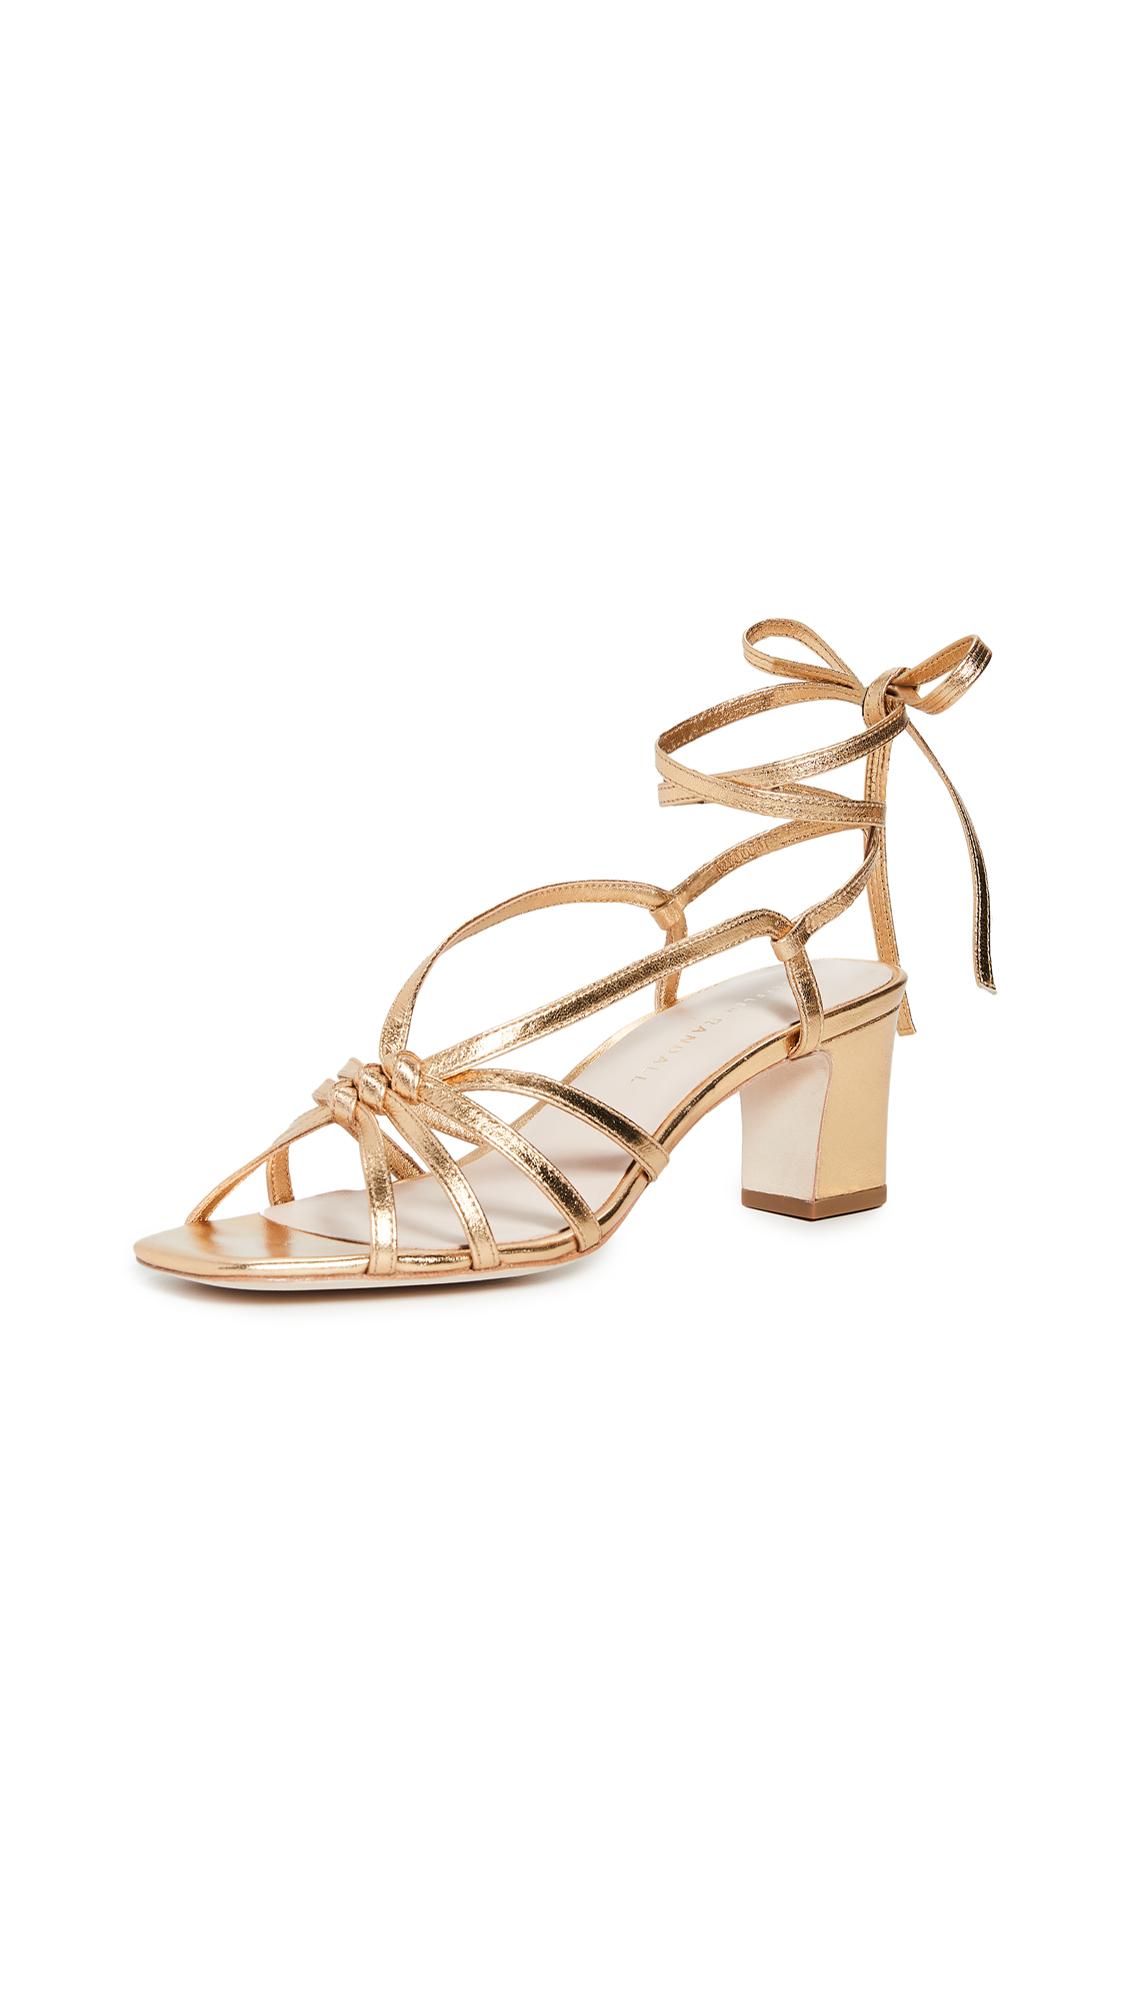 Buy Loeffler Randall Libby Knotted Wrap Sandals online, shop Loeffler Randall